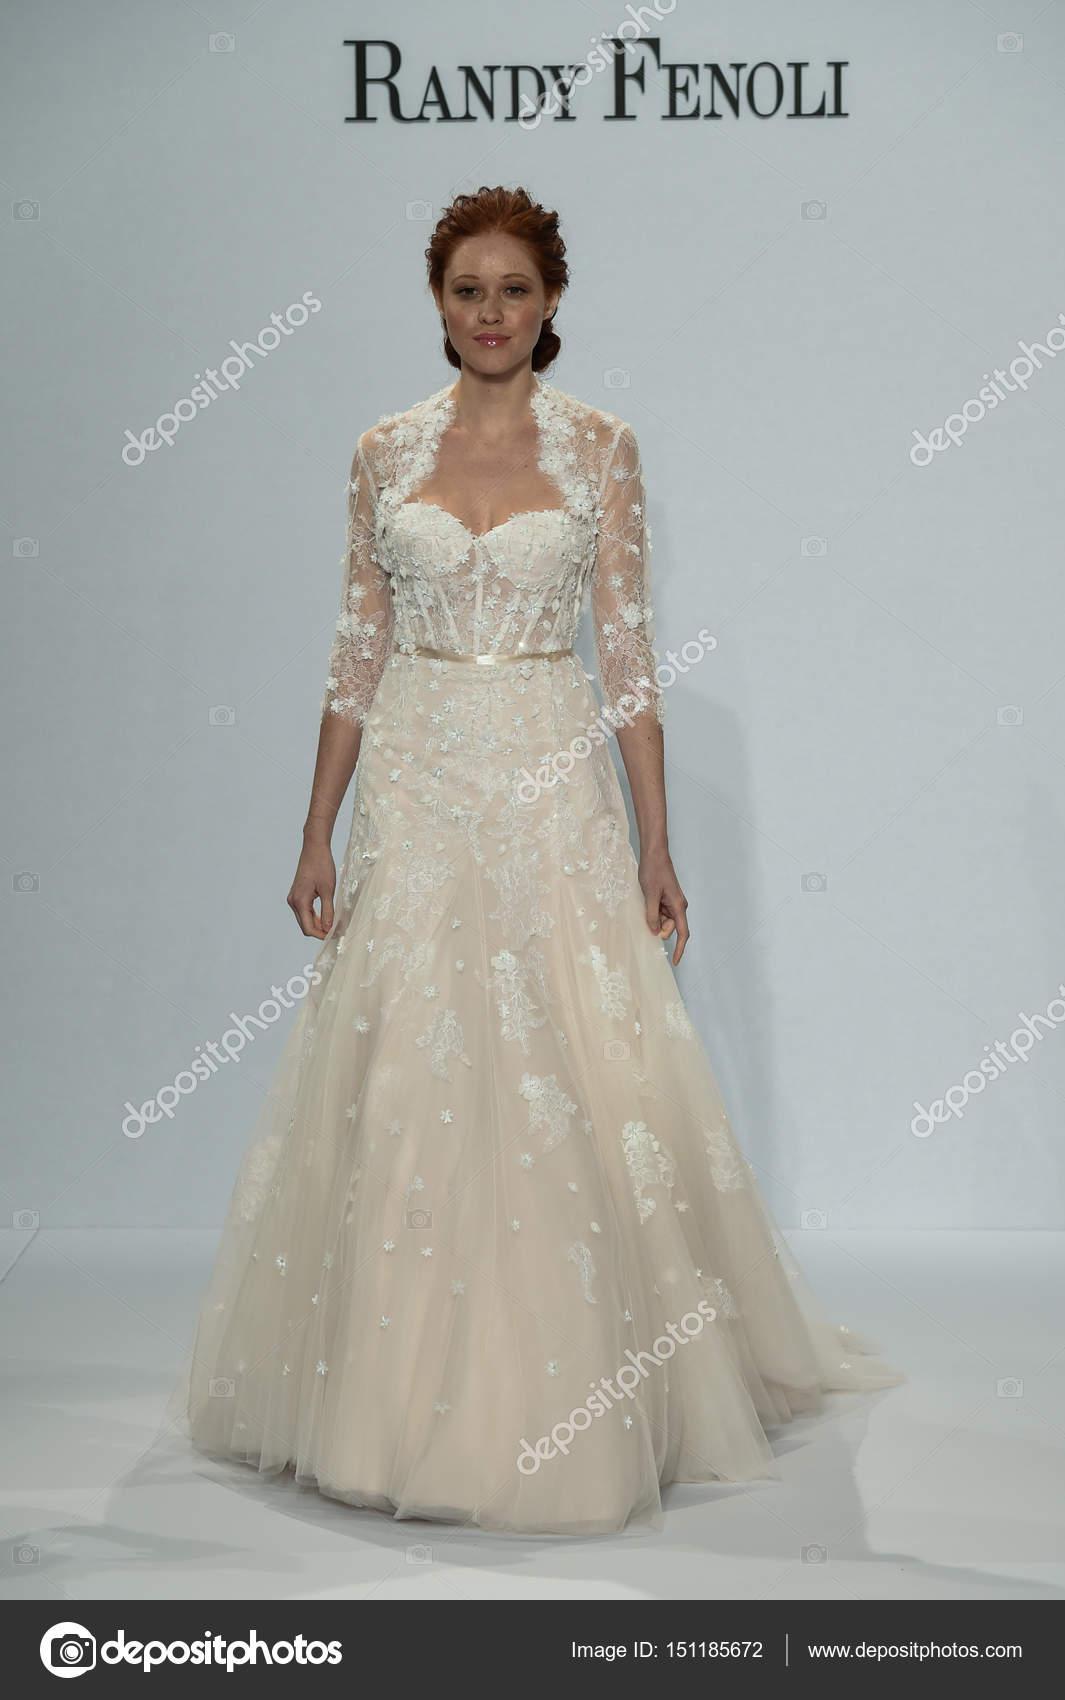 Voir La Randy Fenoli Bridal Photo éditoriale Fashionstock 151185672